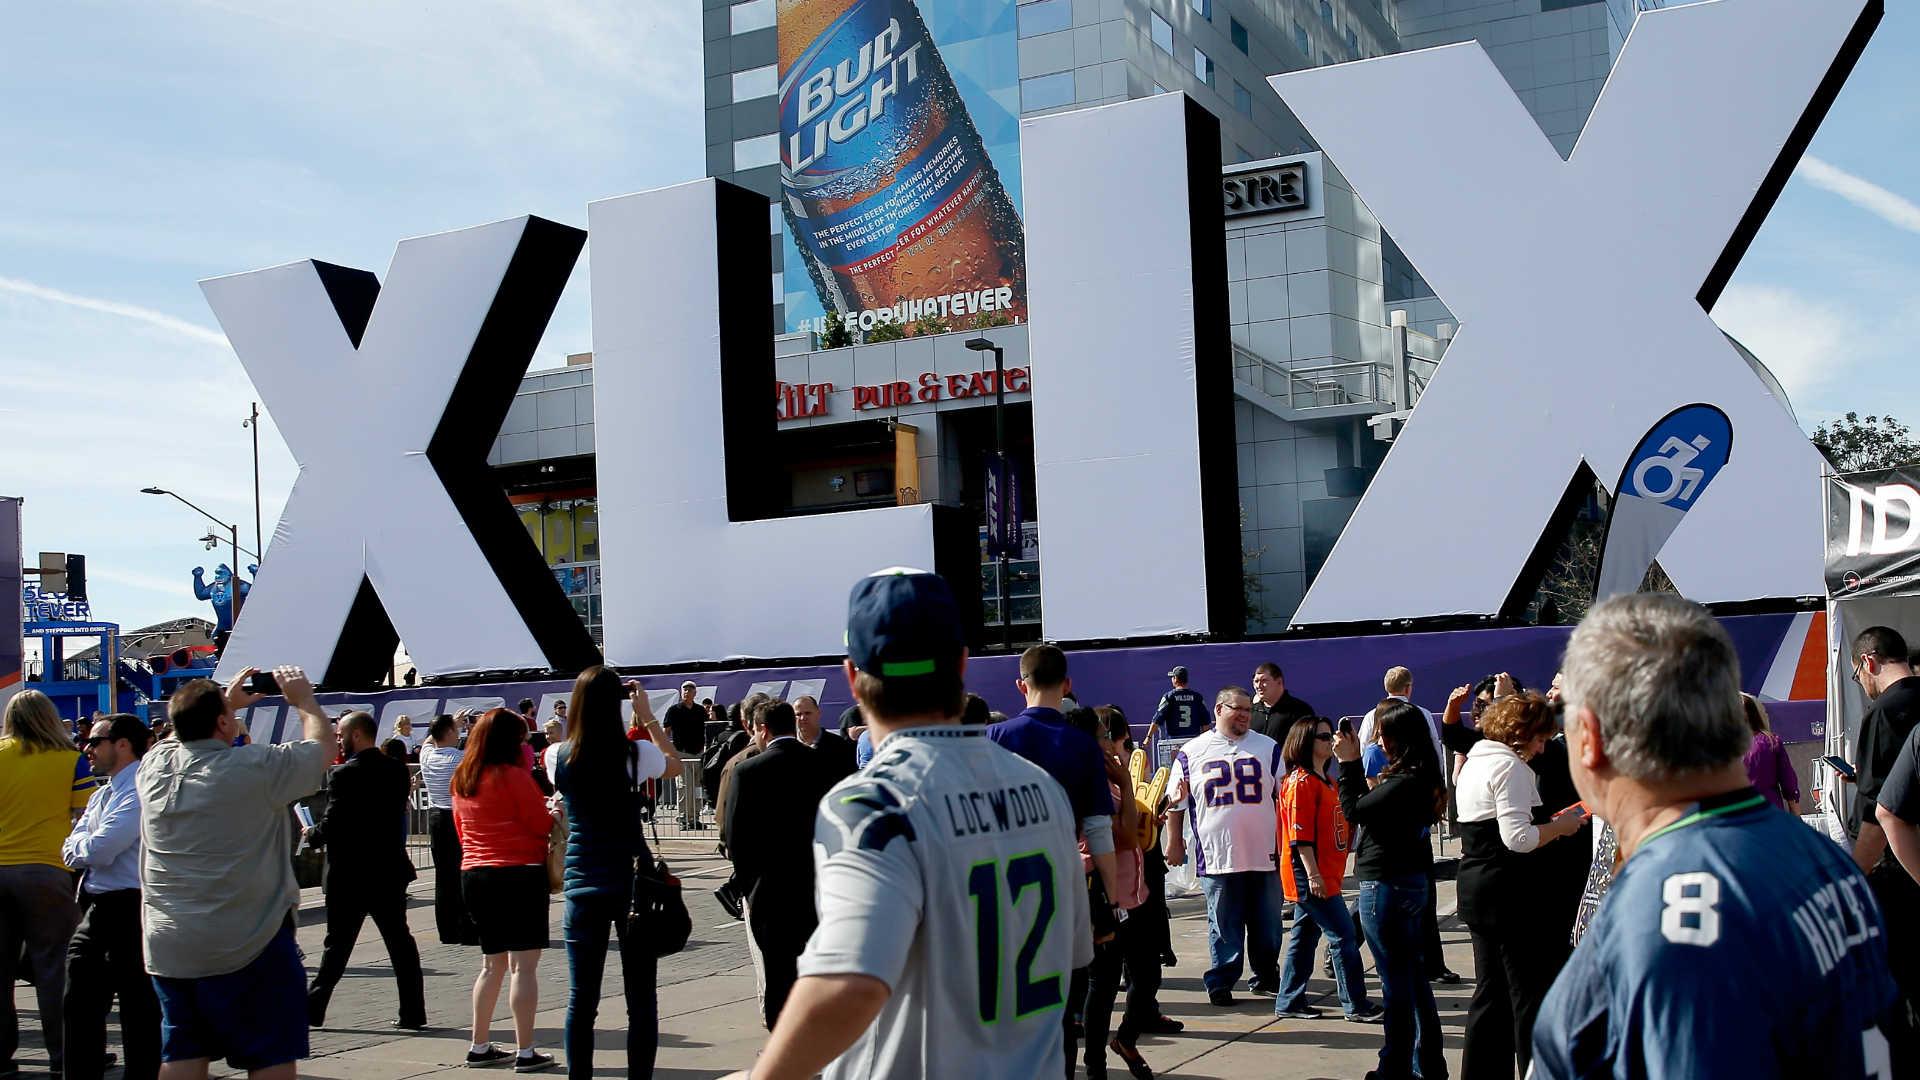 Super-Bowl-fans-013115-Getty-FTR.jpg